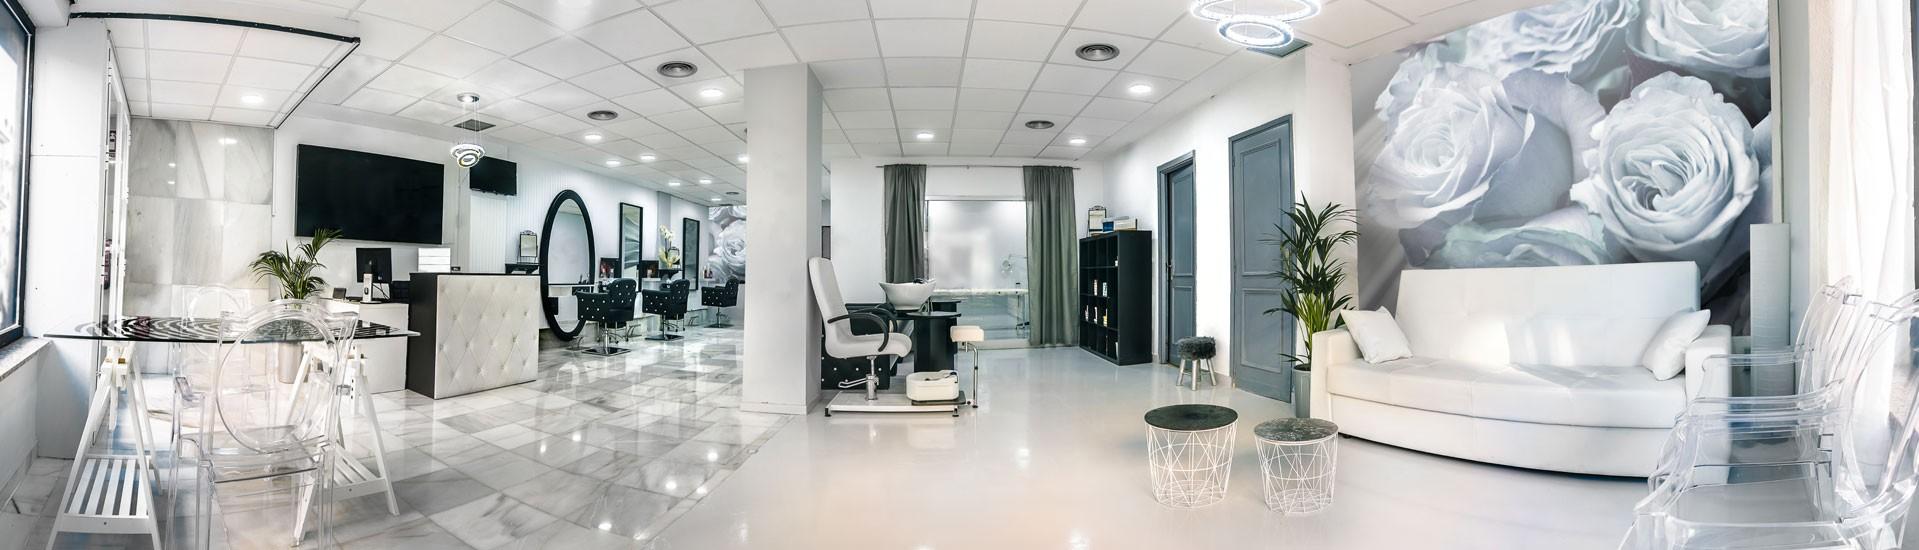 Great Mobilier Salon De Coiffure Luxe